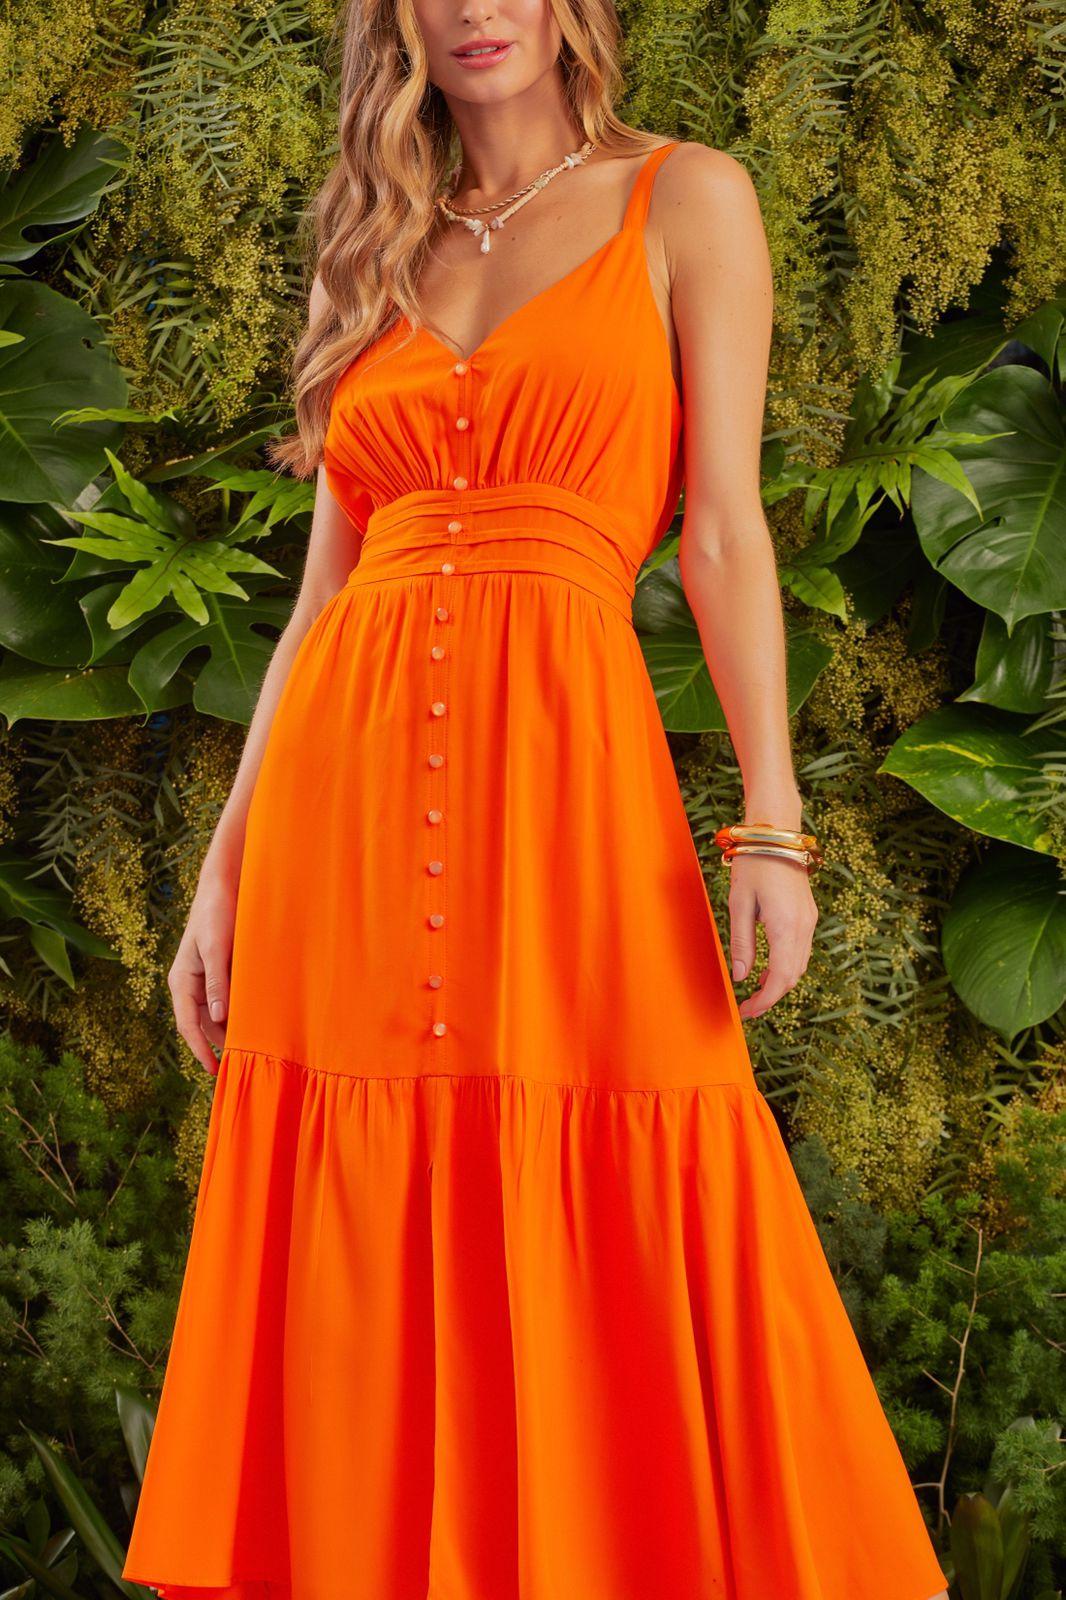 Vestido Nati Vicose (Forro) Detalhe Elástico Cintura Botões C/ Fenda